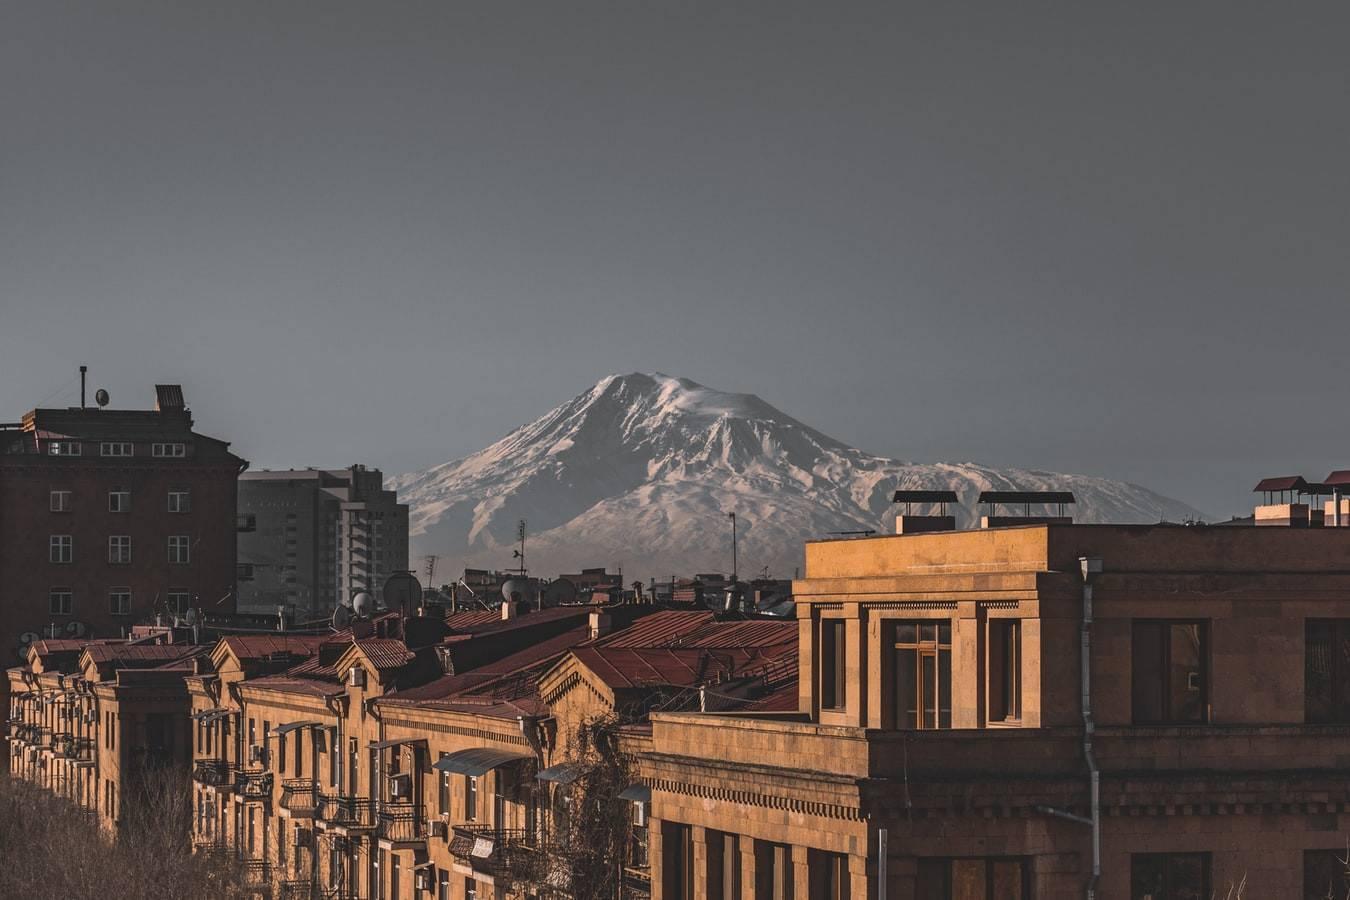 OpenOwnership. Հայաստանի՝ արդյունահանող ոլորտի բացահայտումների նոր արդյունքները